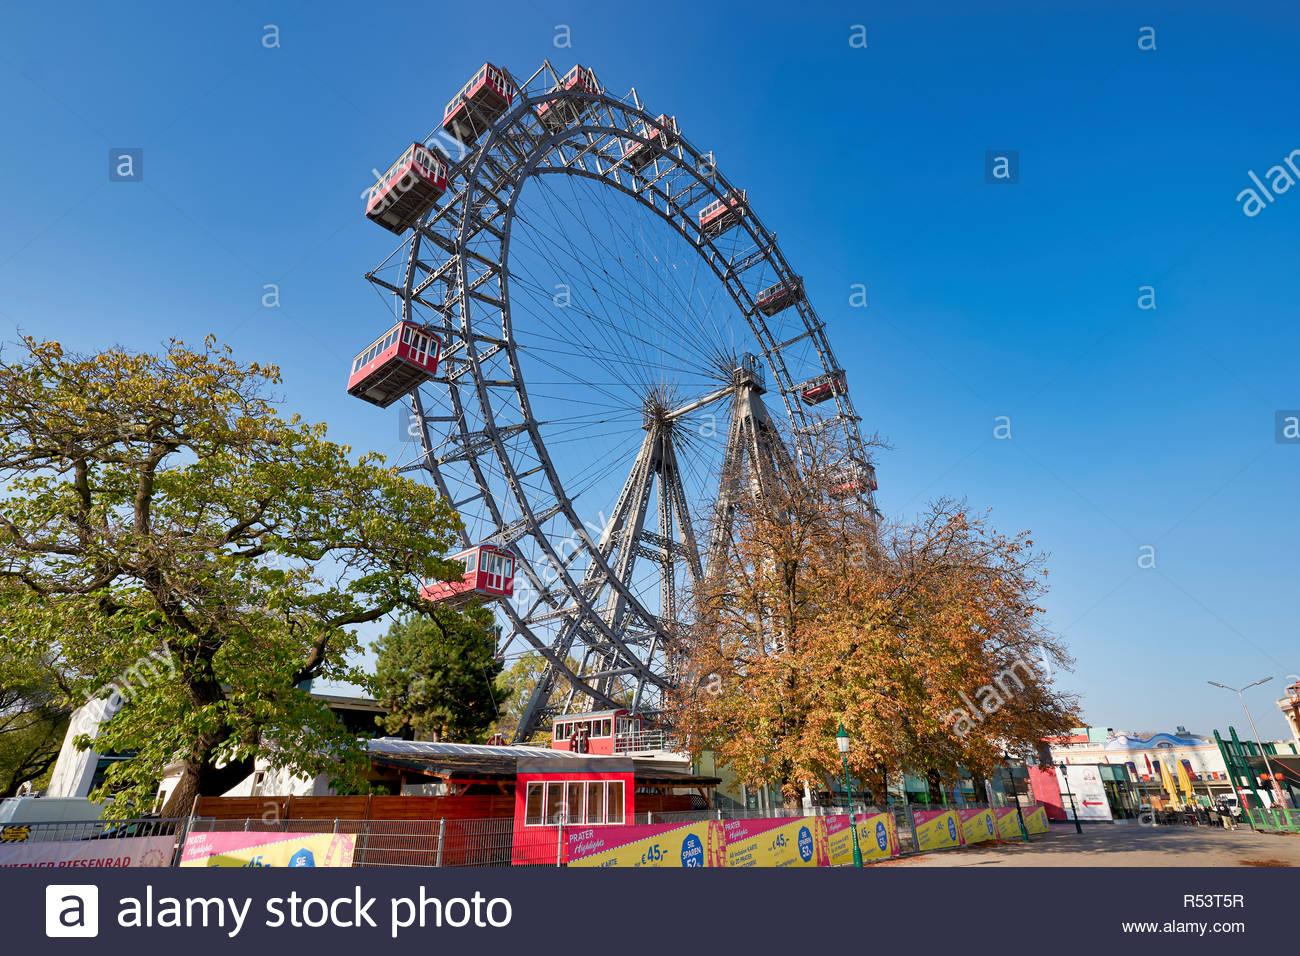 Riesenrad Panoramic Wheel. Prater Park. The oldest ferris wheel in the World. Vienna Austria - Stock Image